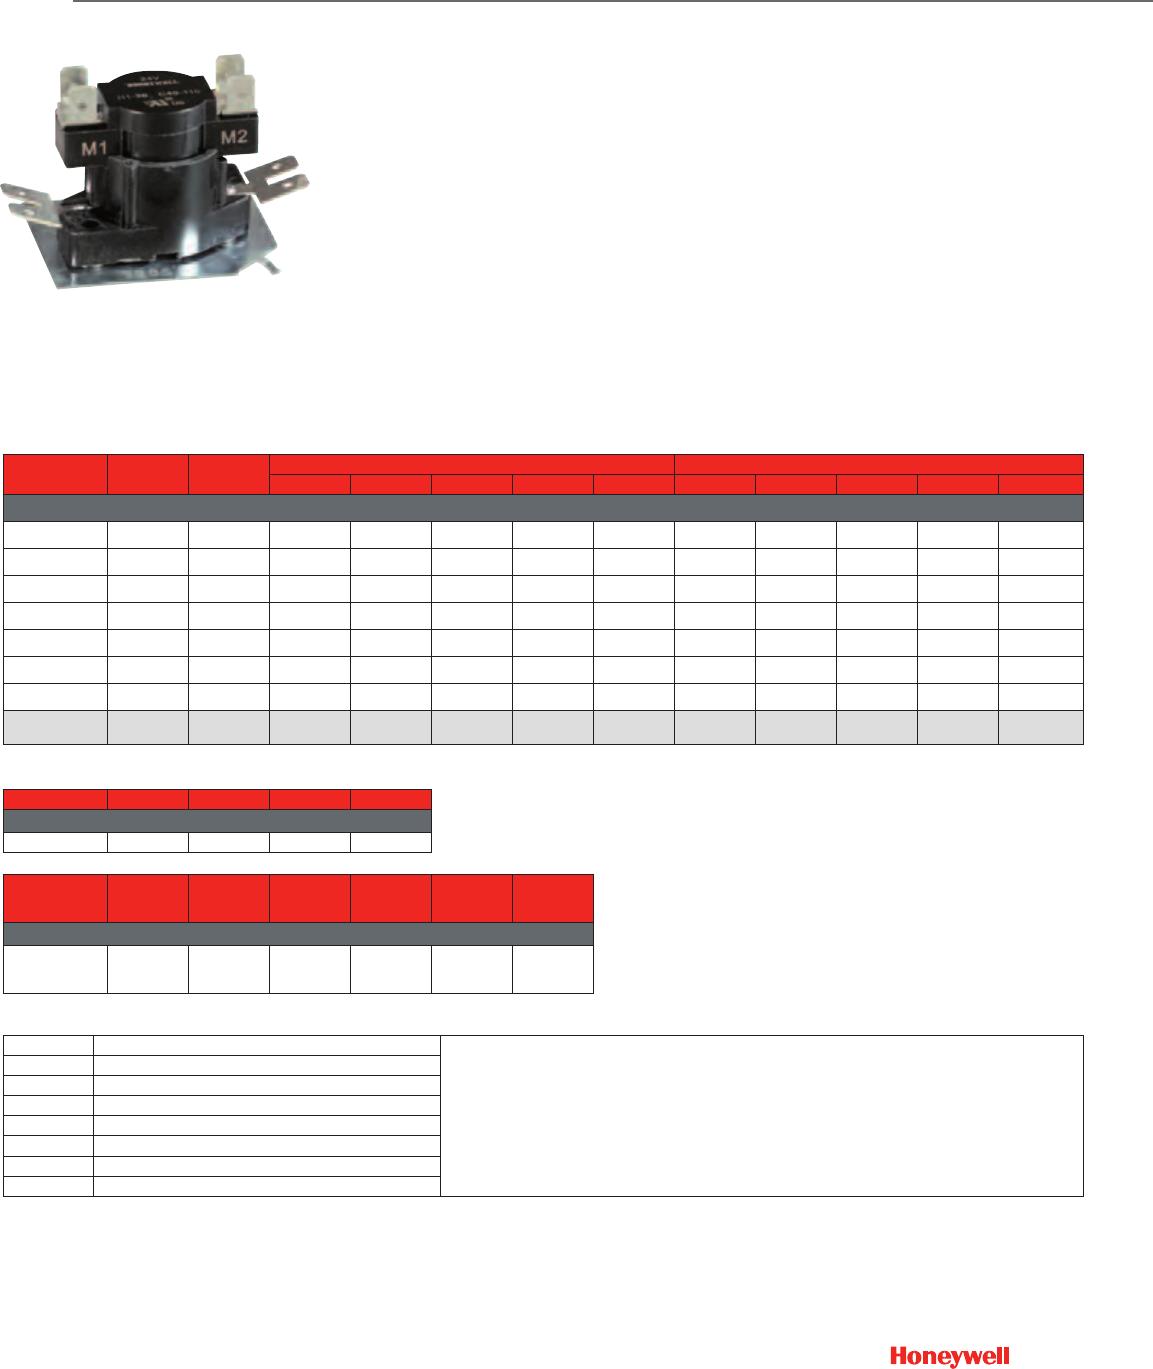 Mars 61756 Contactor Wiring Diagram Trusted Schematics Mitsubishi Minicab U62t 1000495857 Catalog